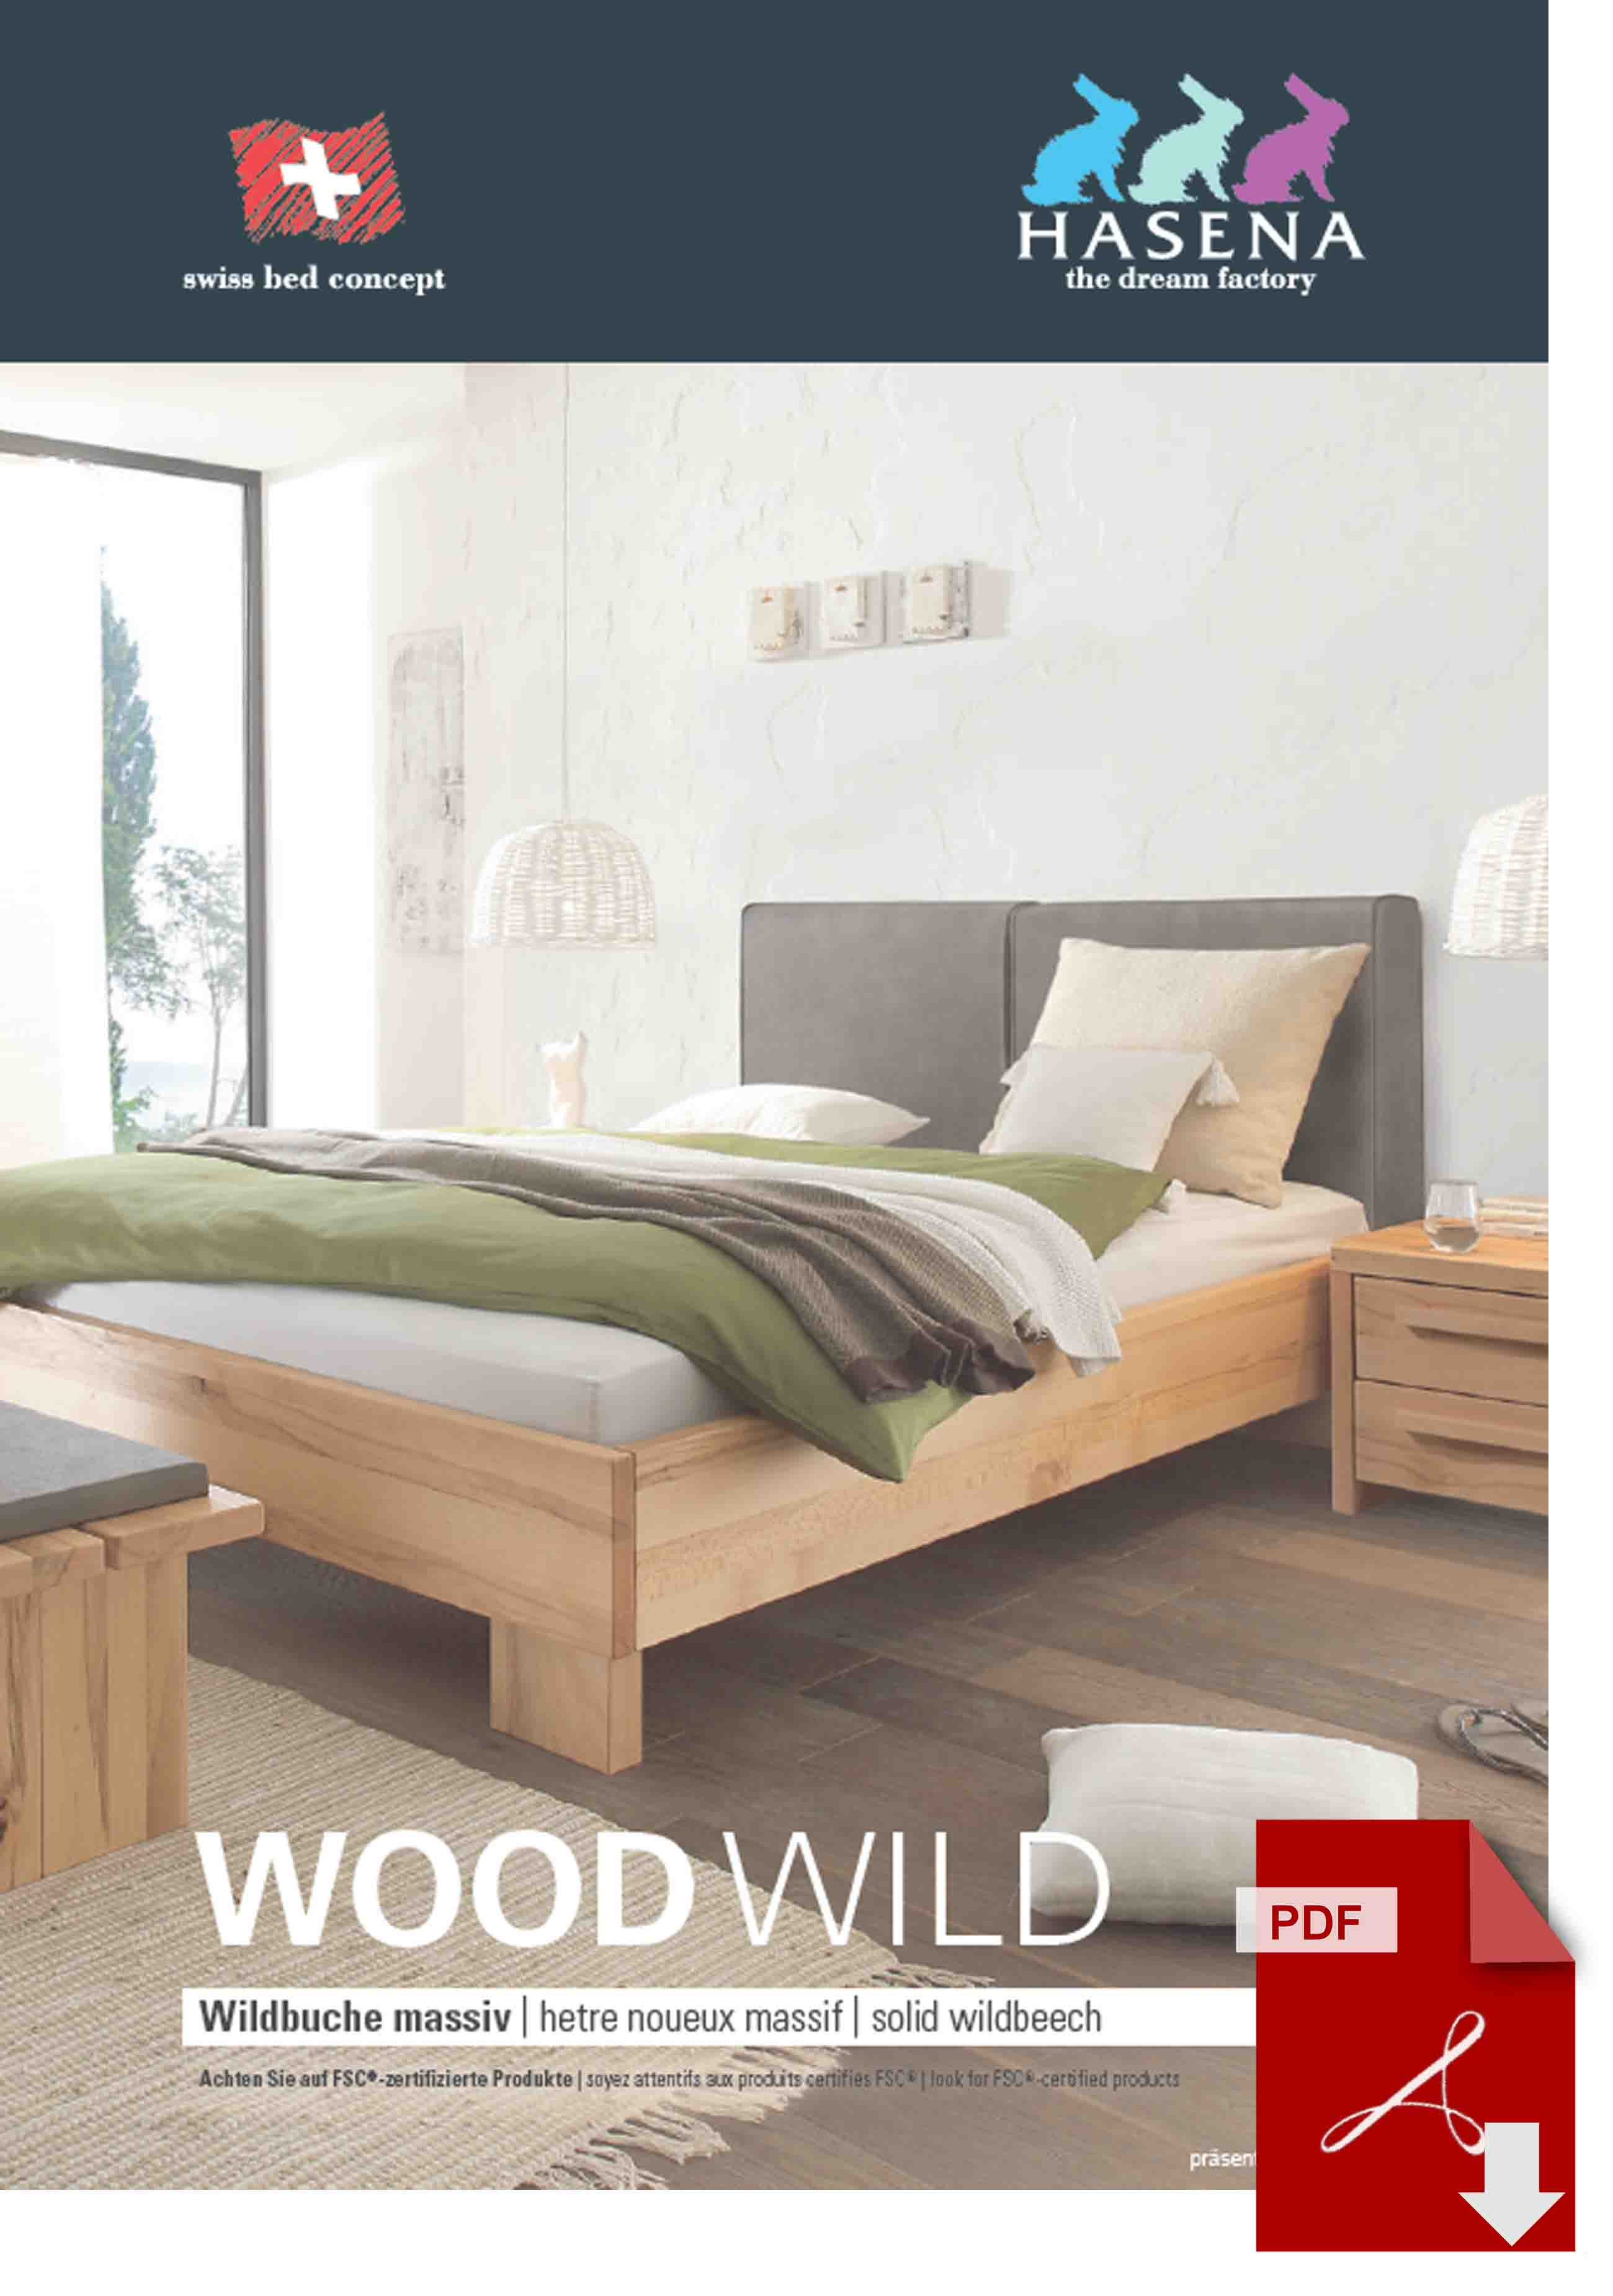 Hasena Wood Wild Katalog als PDF Datei